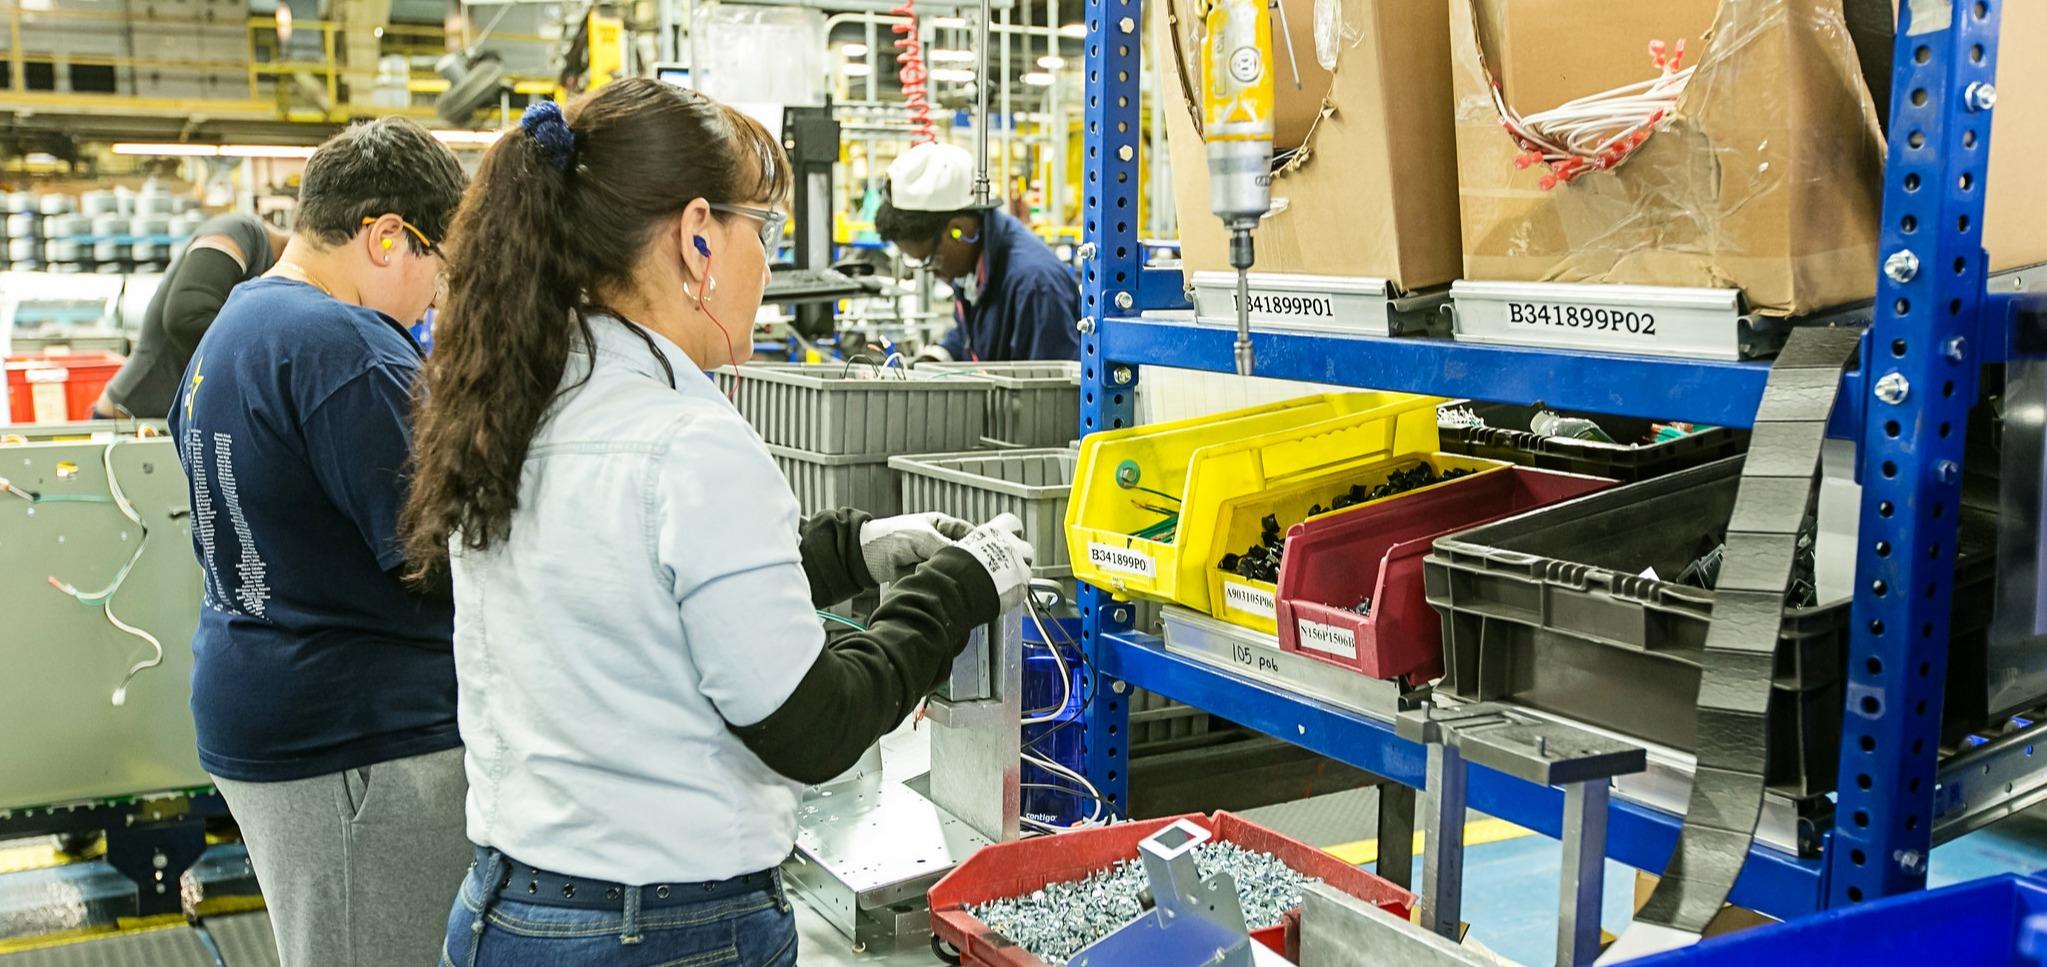 WIP in Manufacturing